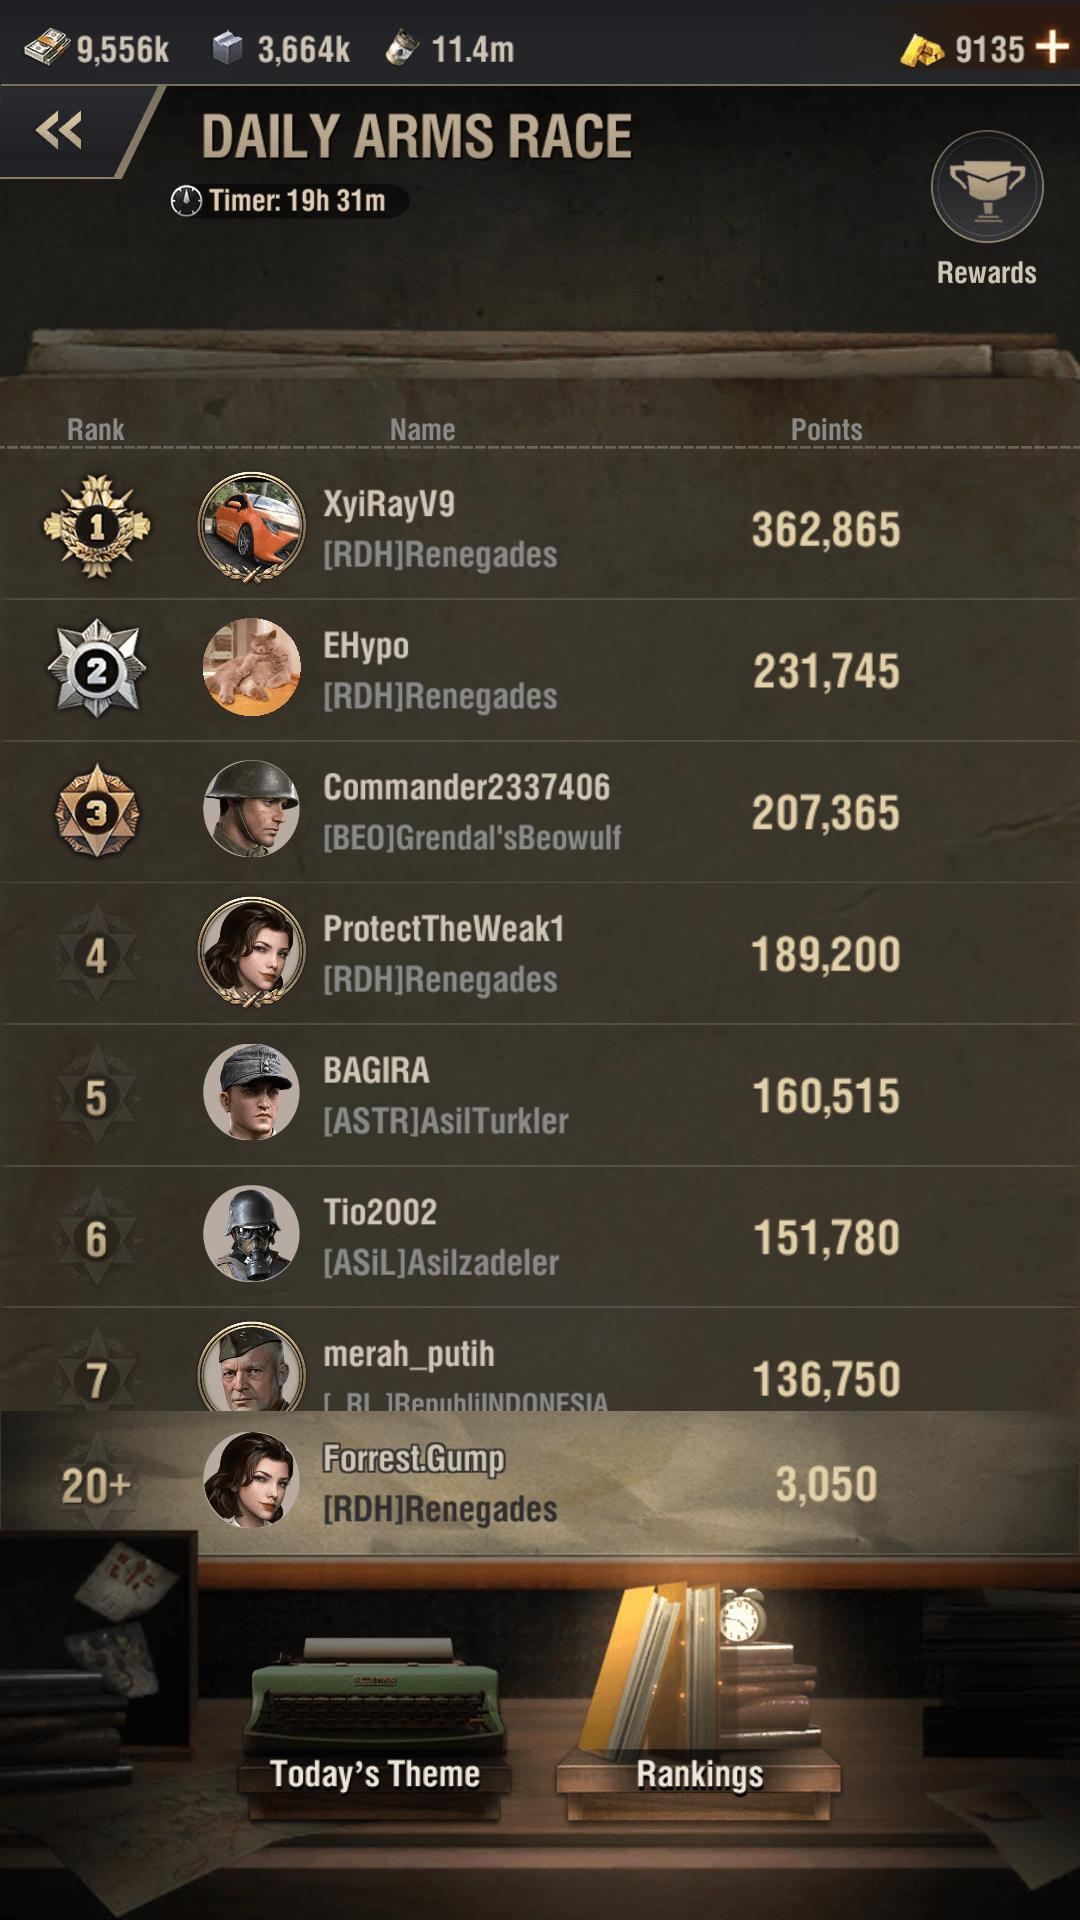 warpath arms race event screenshot 2